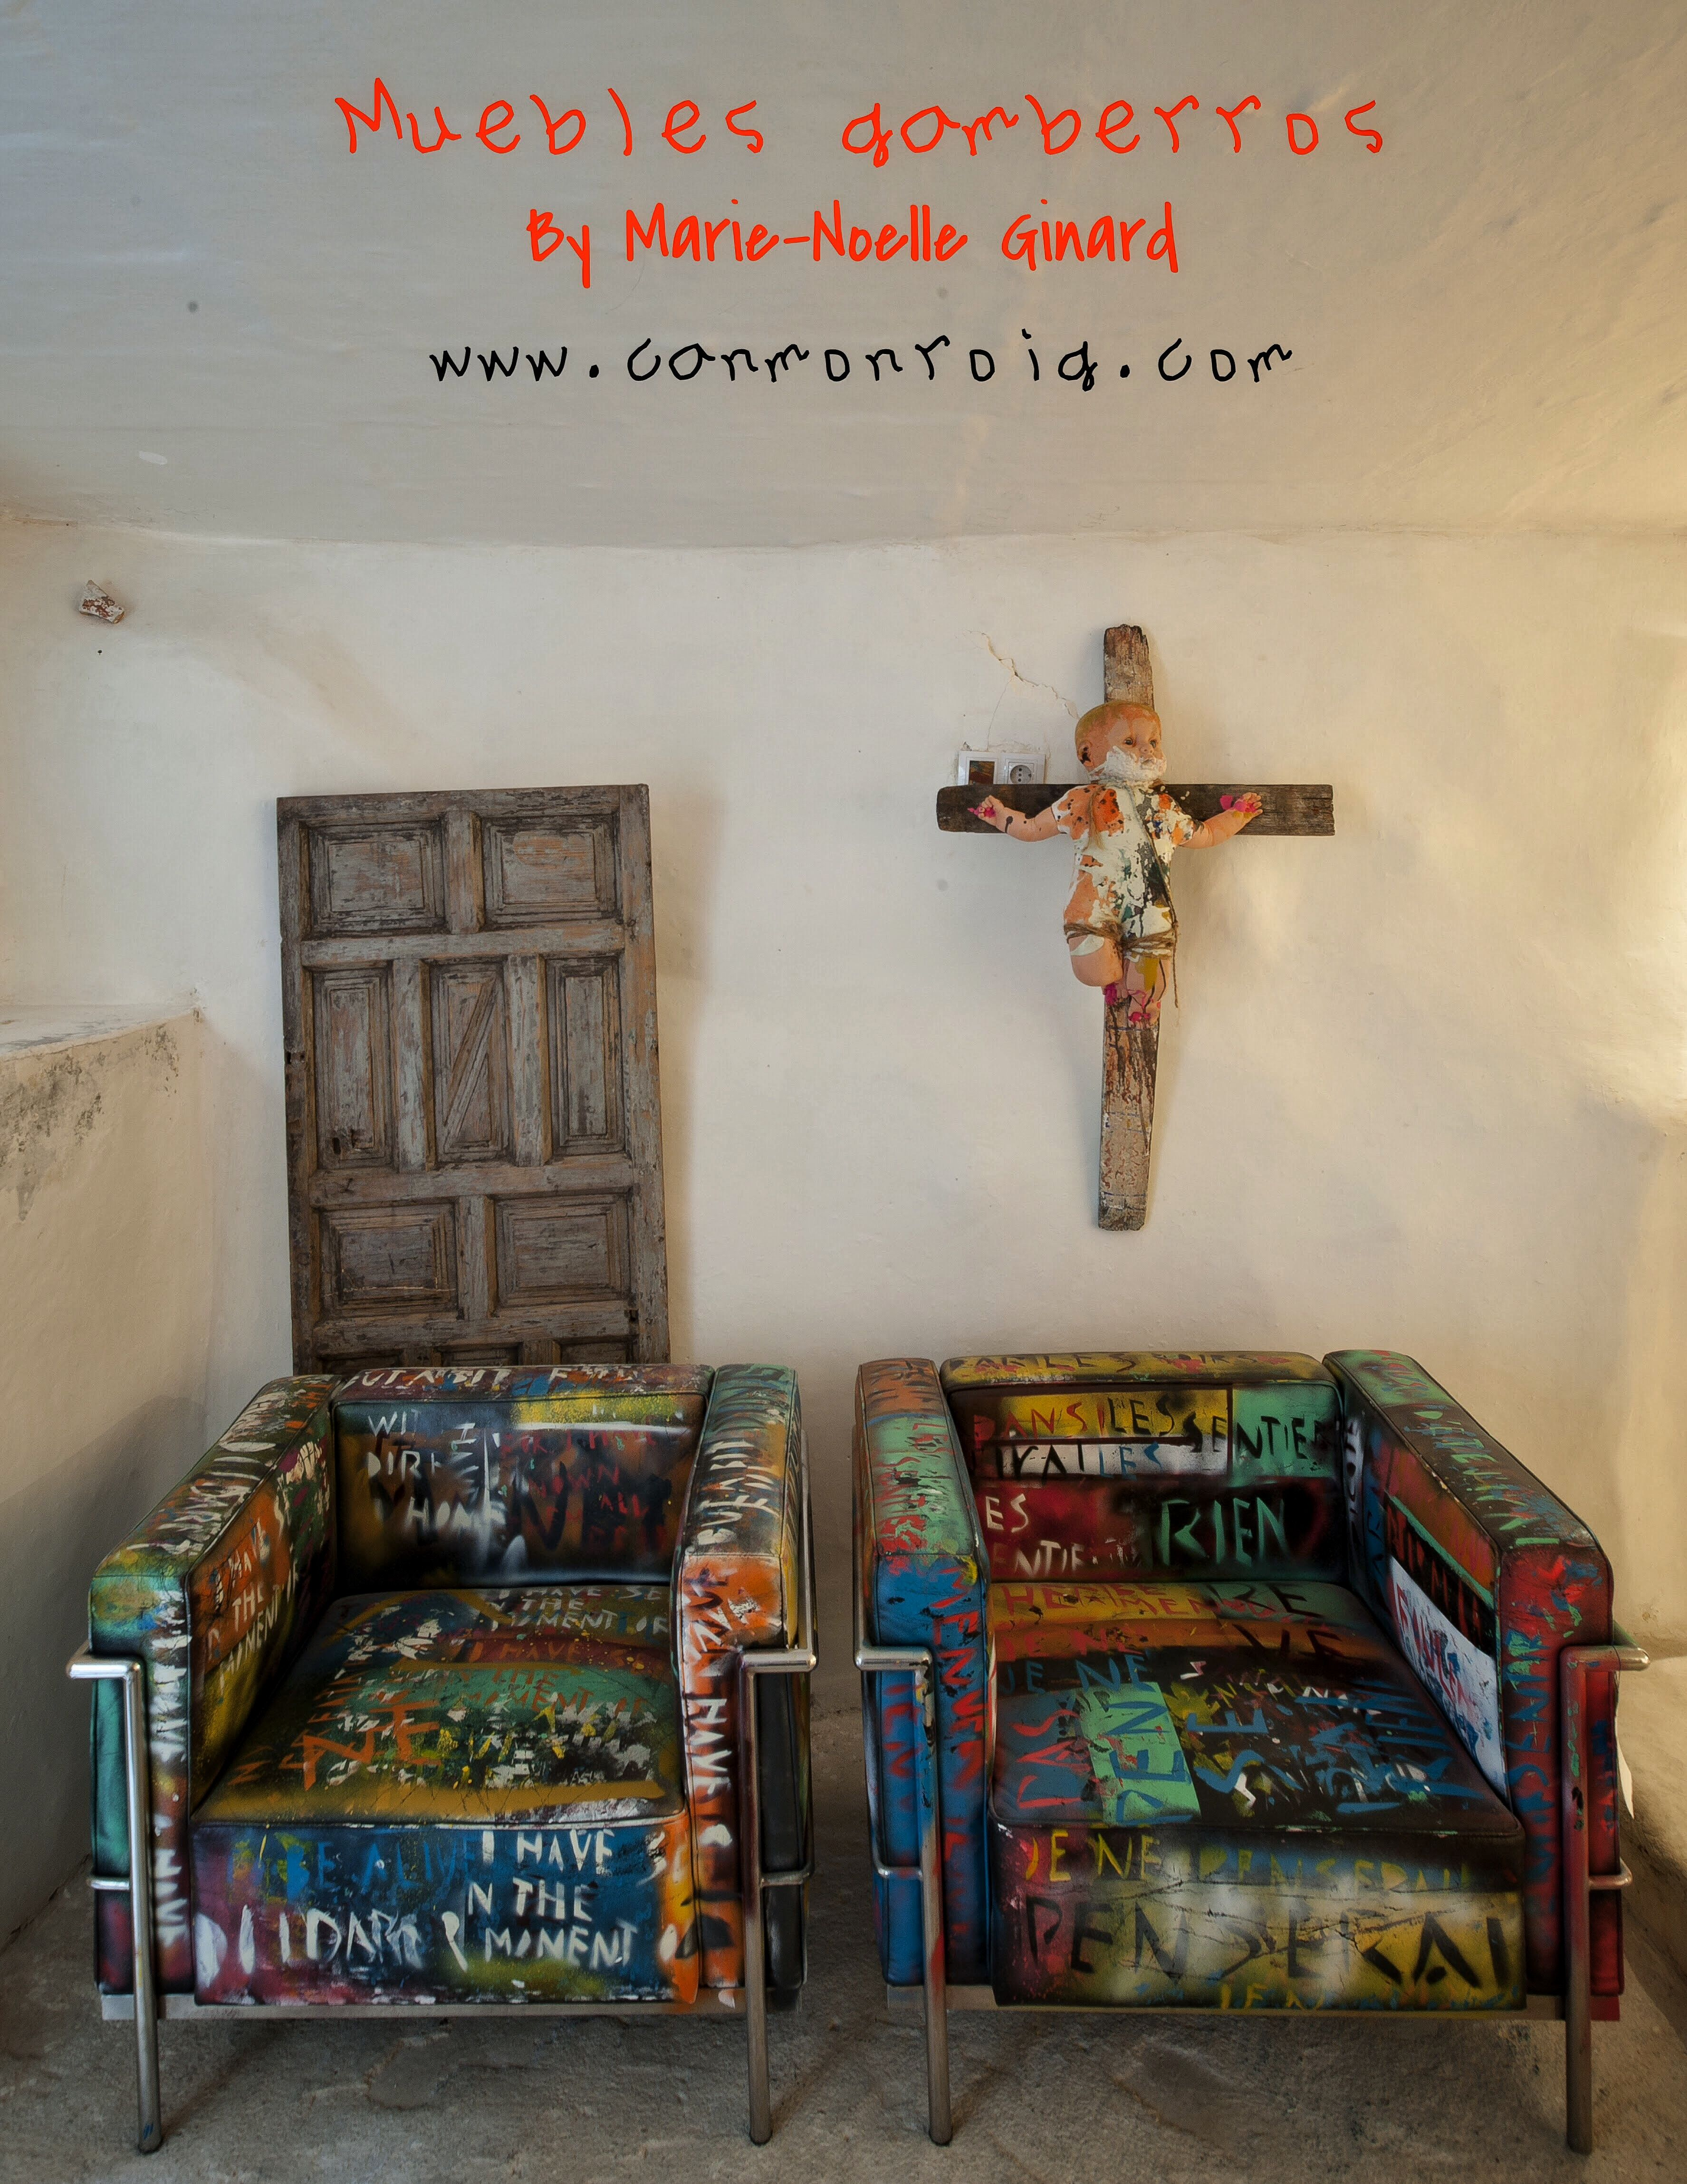 Muebles Gamberros By Can Monroig Decoraci N Y Arte Gamberro  # Muebles Natalia Esperanza